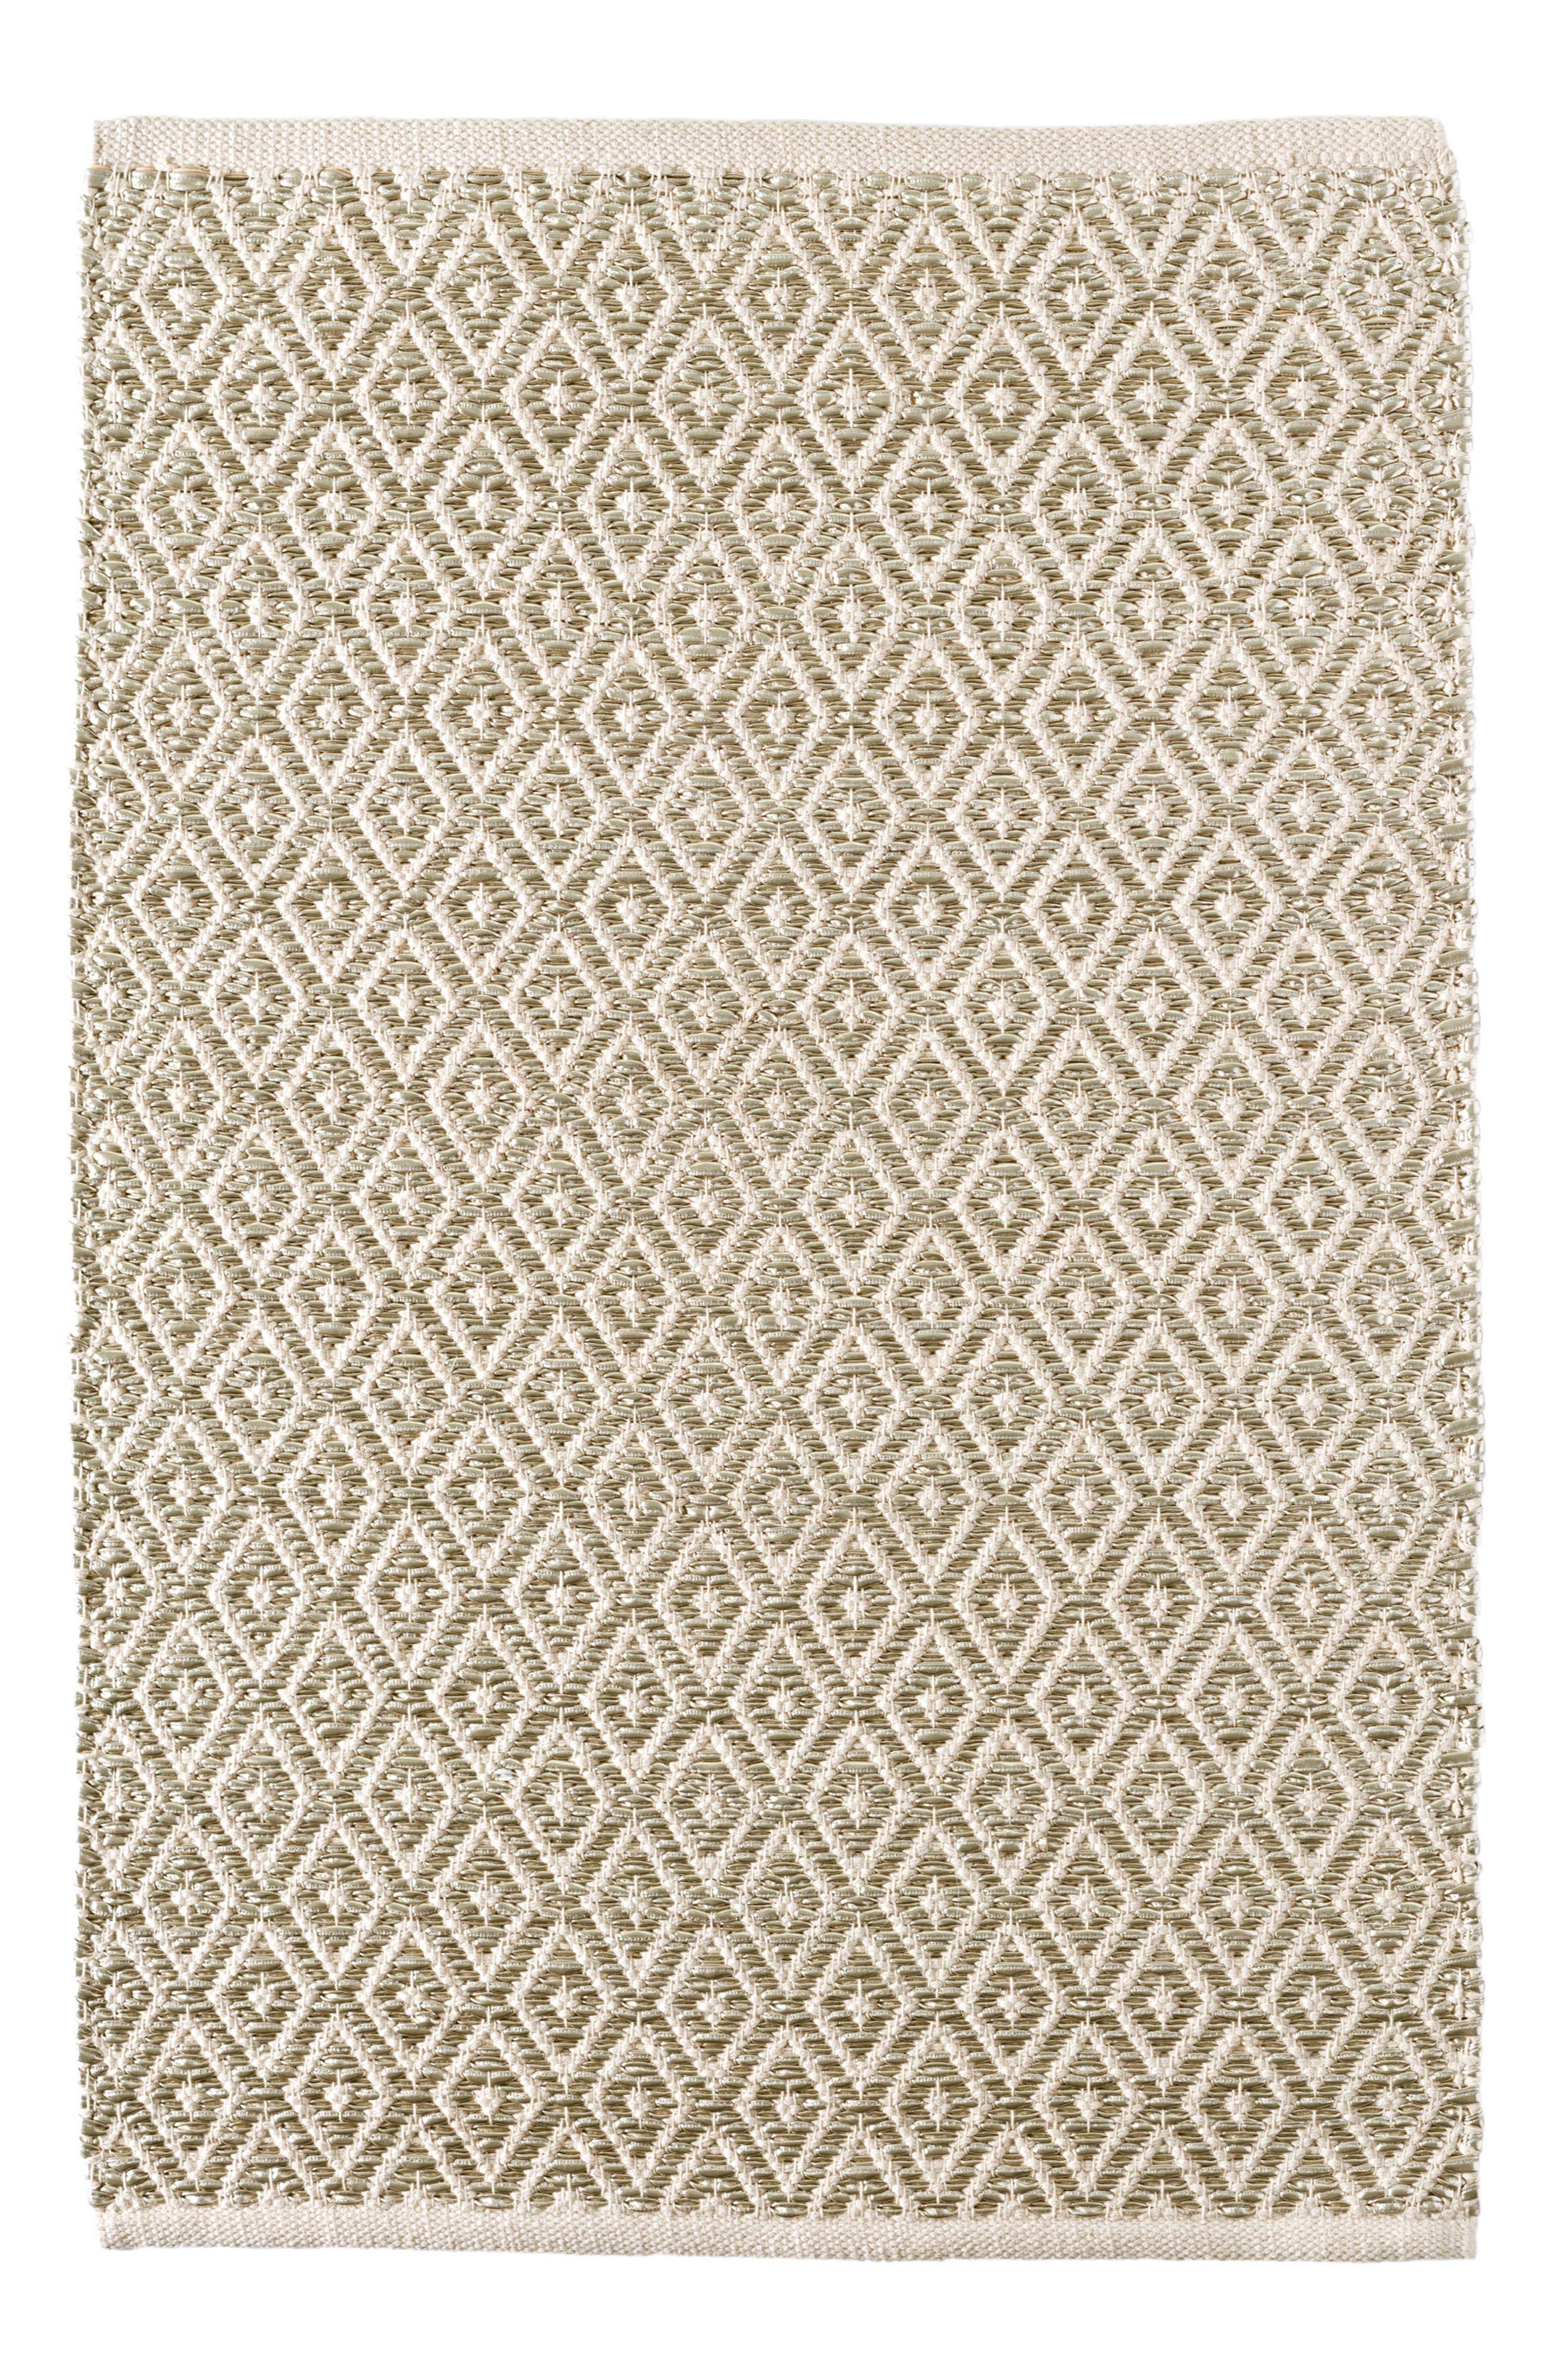 Main Image - Dash & Albert Glitter Diamond Woven Rug